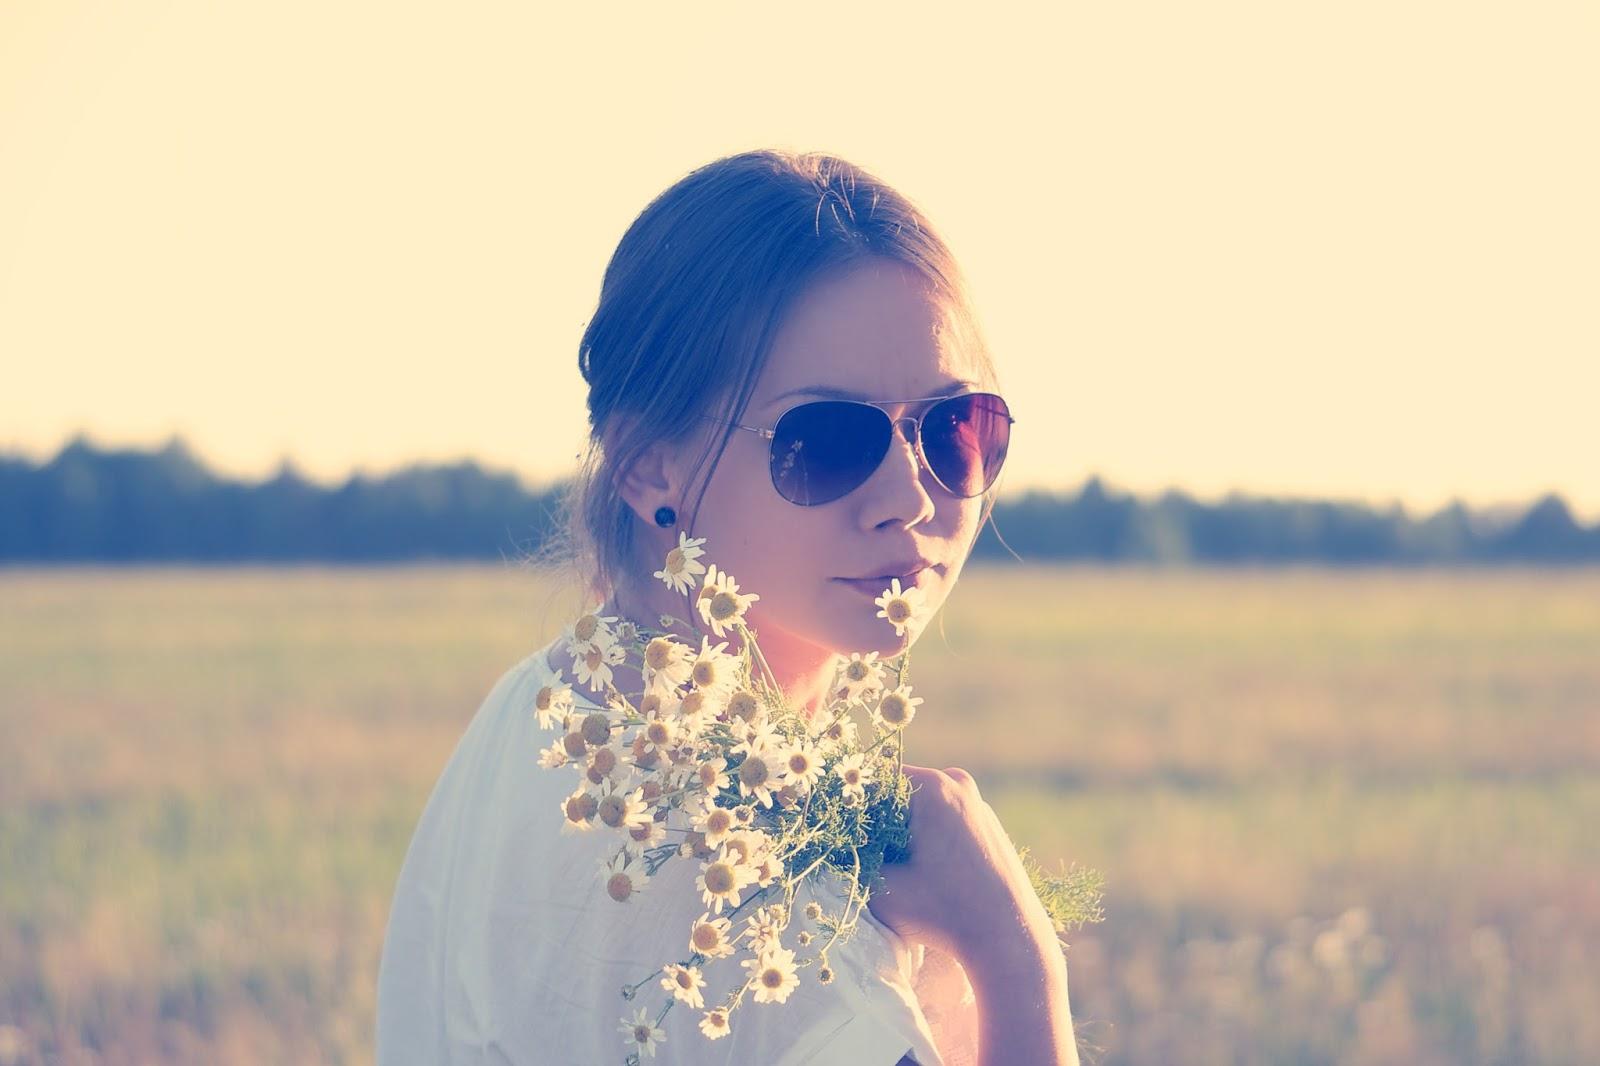 Garota Imperfeita, garota pensando na vida, garota tumblr, Blog para garotas cristãs, por Milene Oliveira